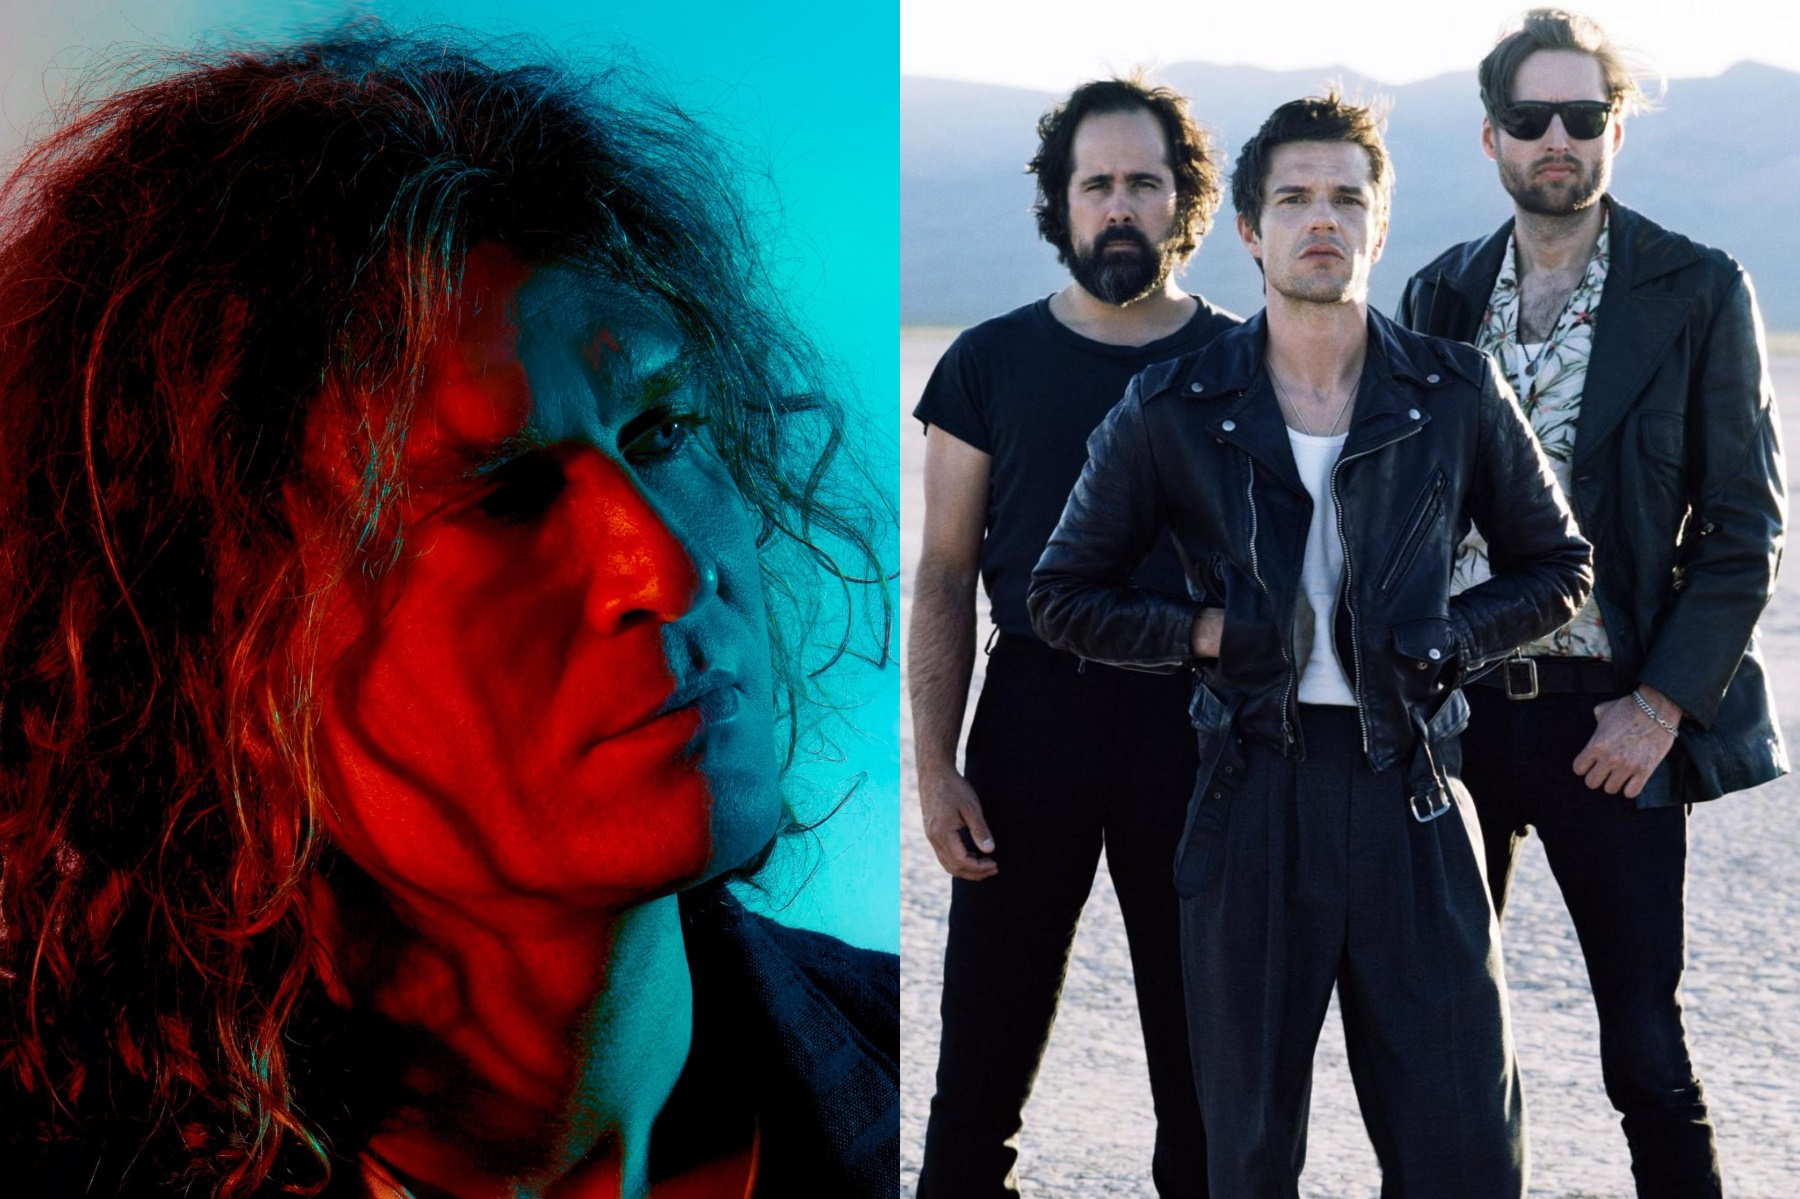 Dave Keuning, guitarrista do The Killers, deixa de ser o único integrante da banda sem projeto solo